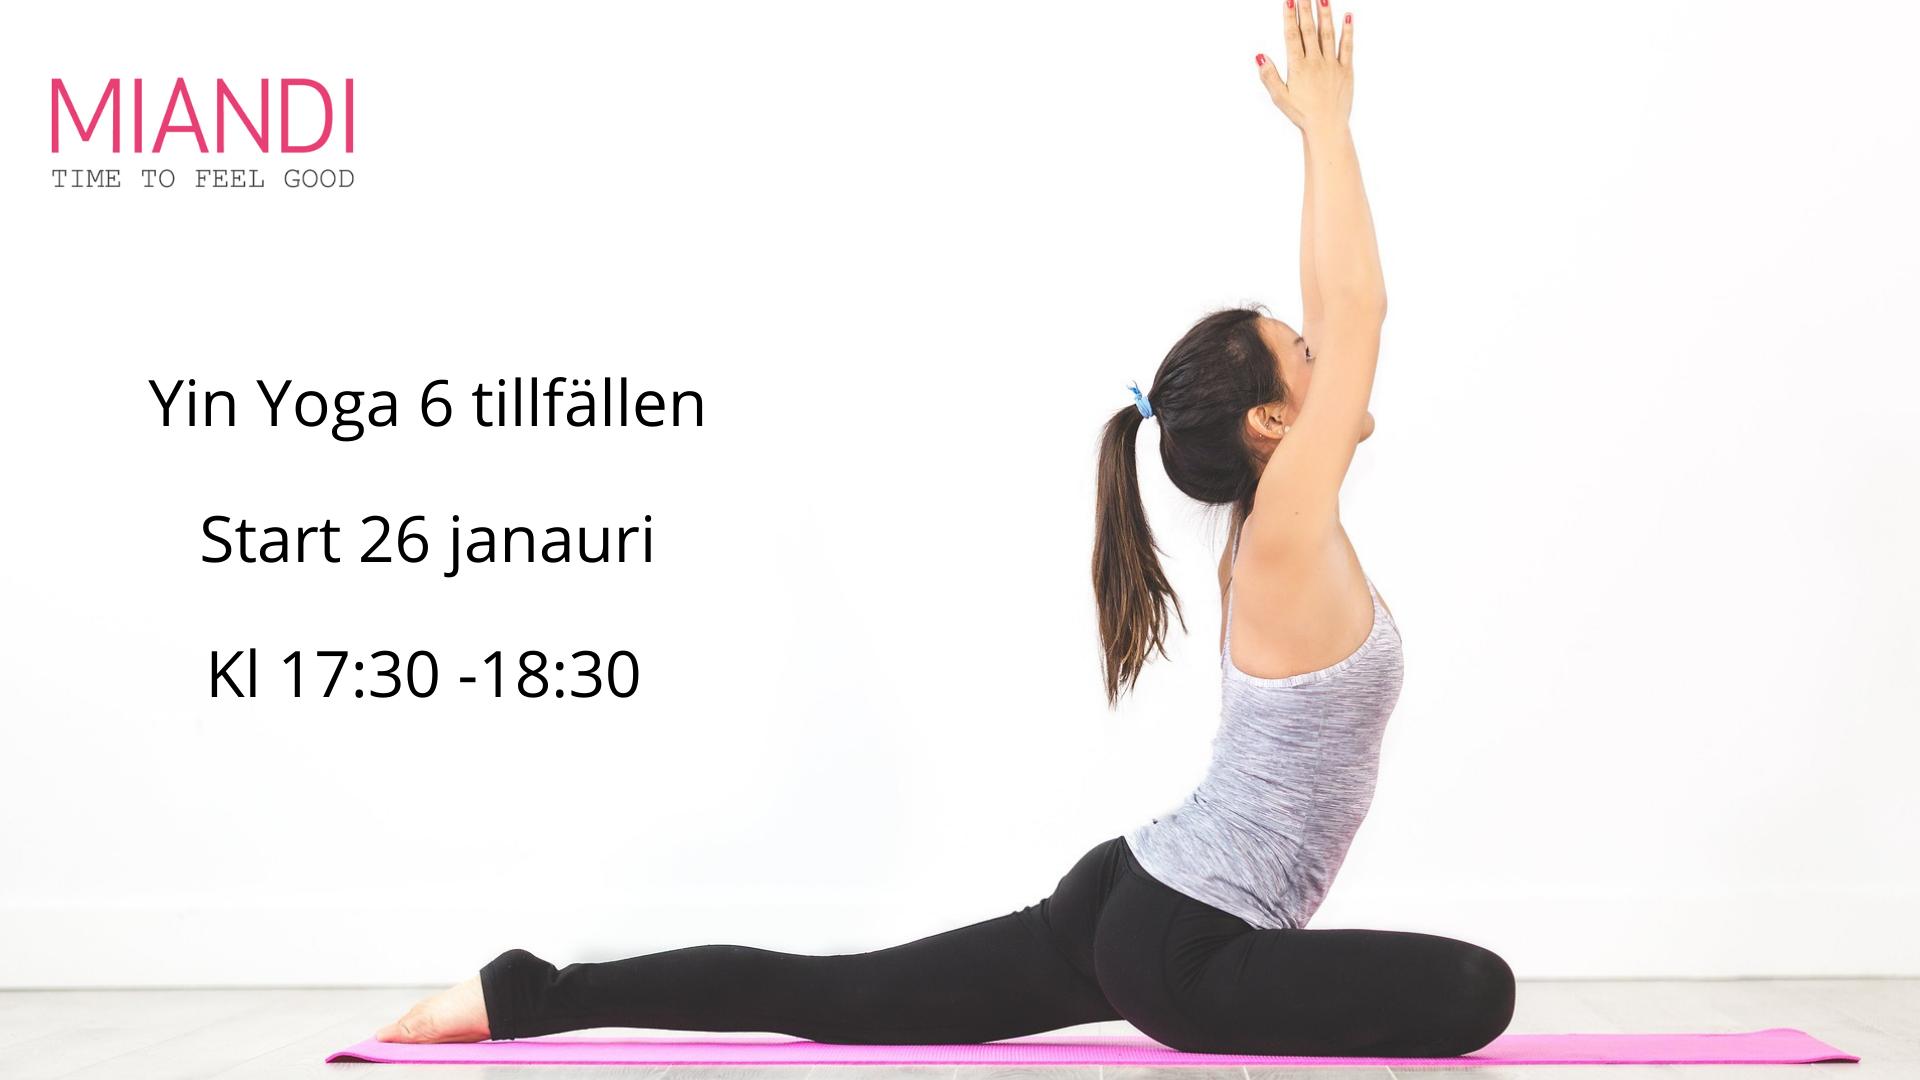 Yin Yoga 6 tillfällen tisdagar